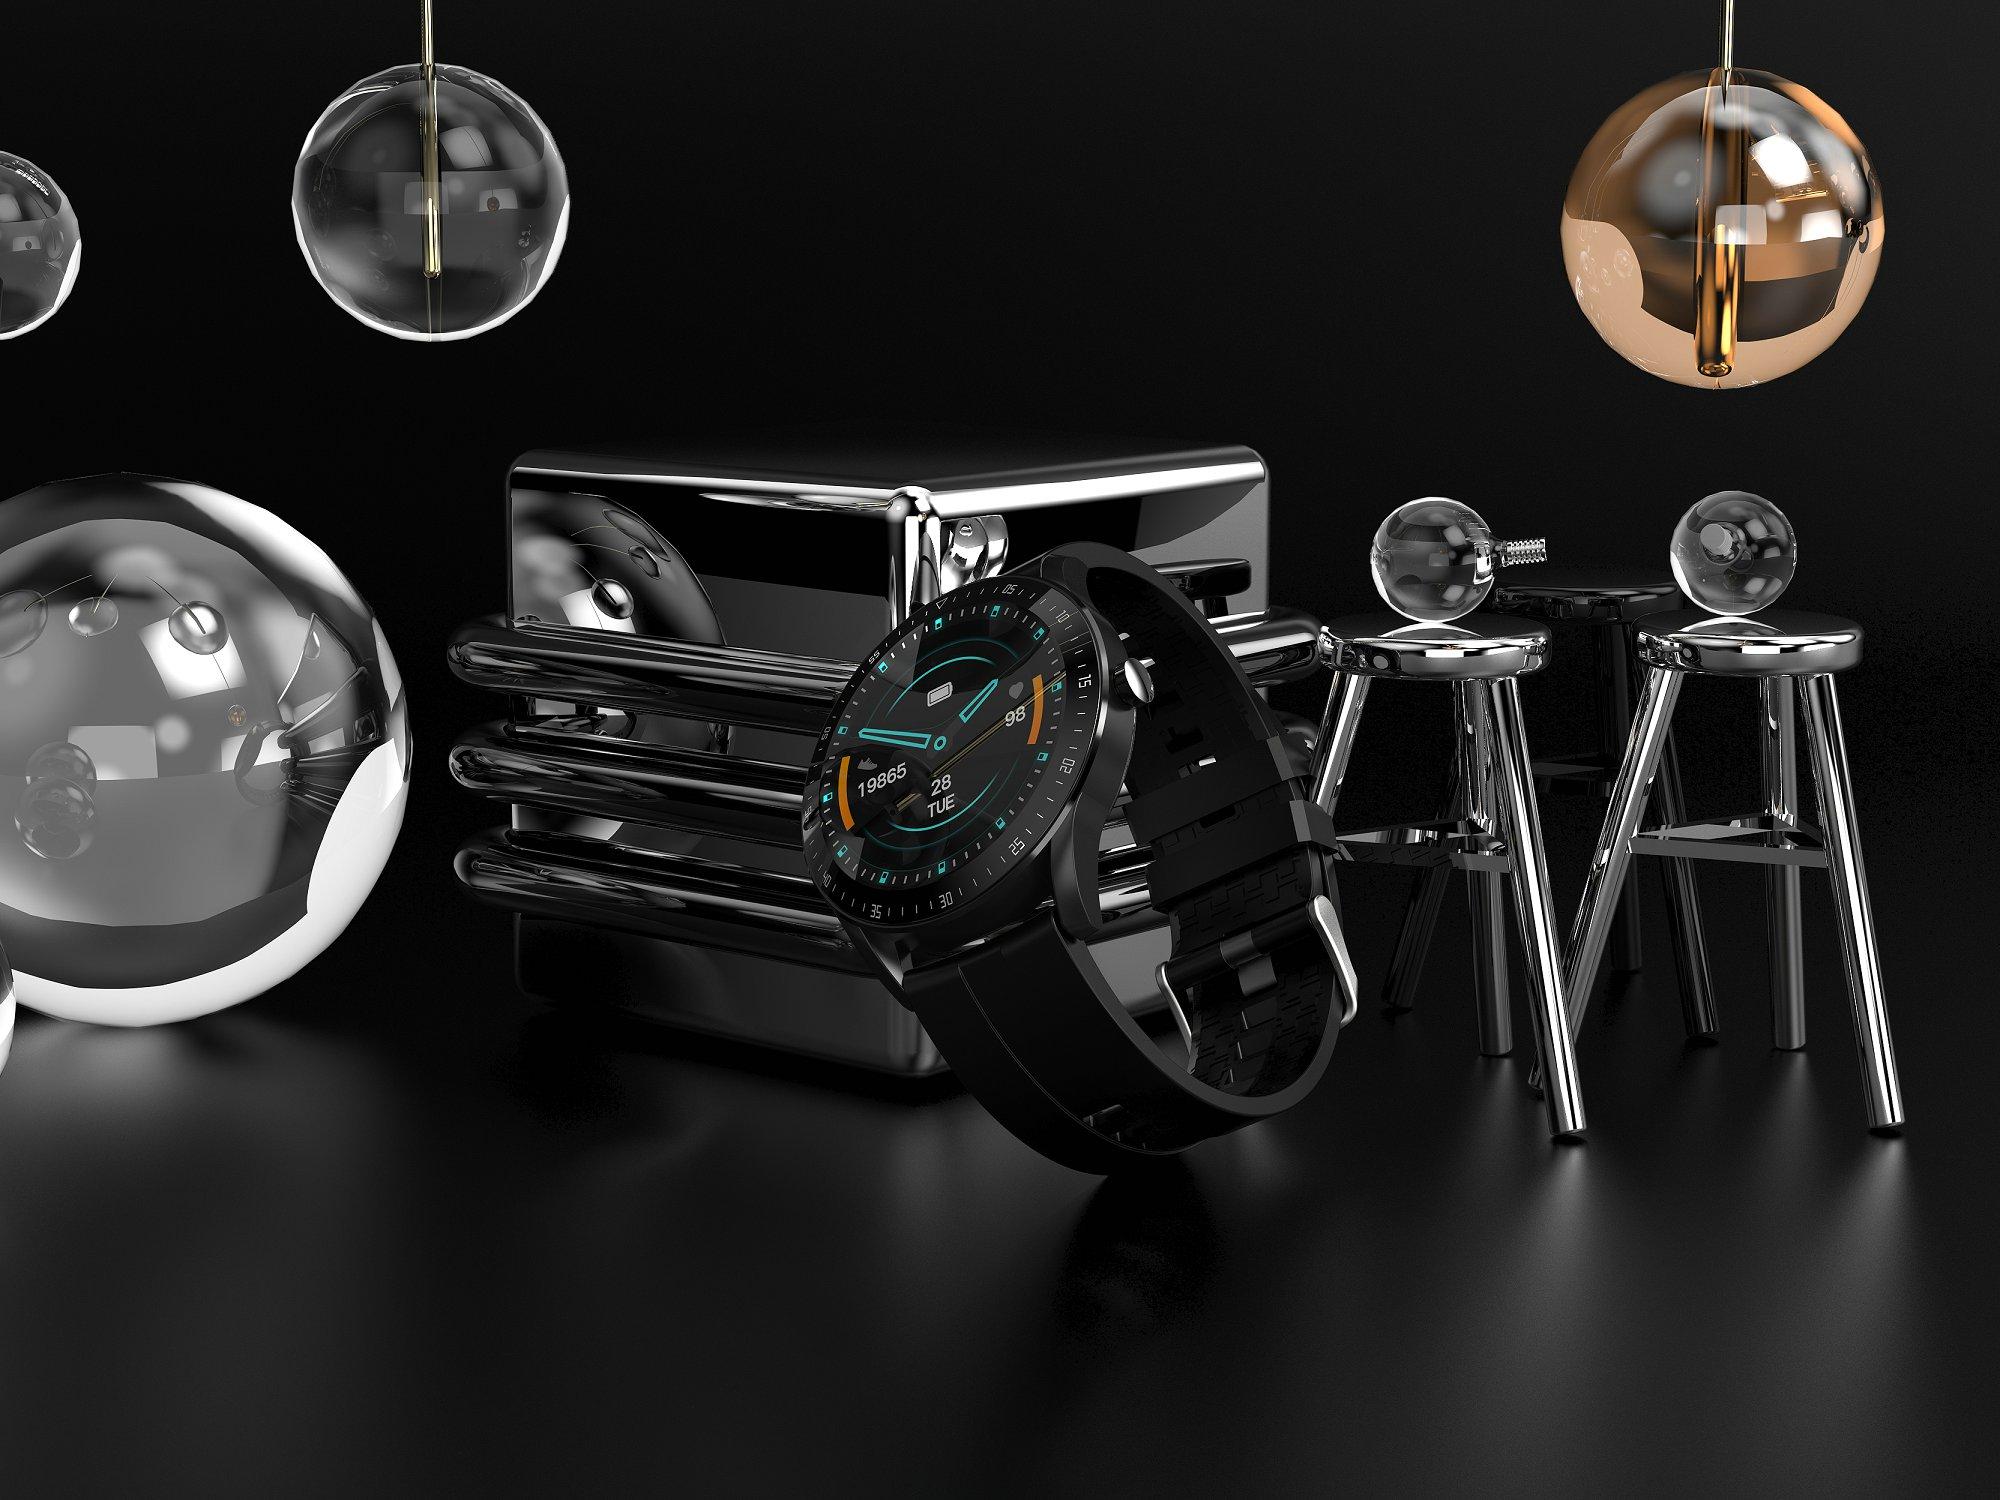 Hedf6cc2abf5a42b0947aeaf7549ed410h LEMFO F15 Full Touch Screen Smart Watch Men 5D Case